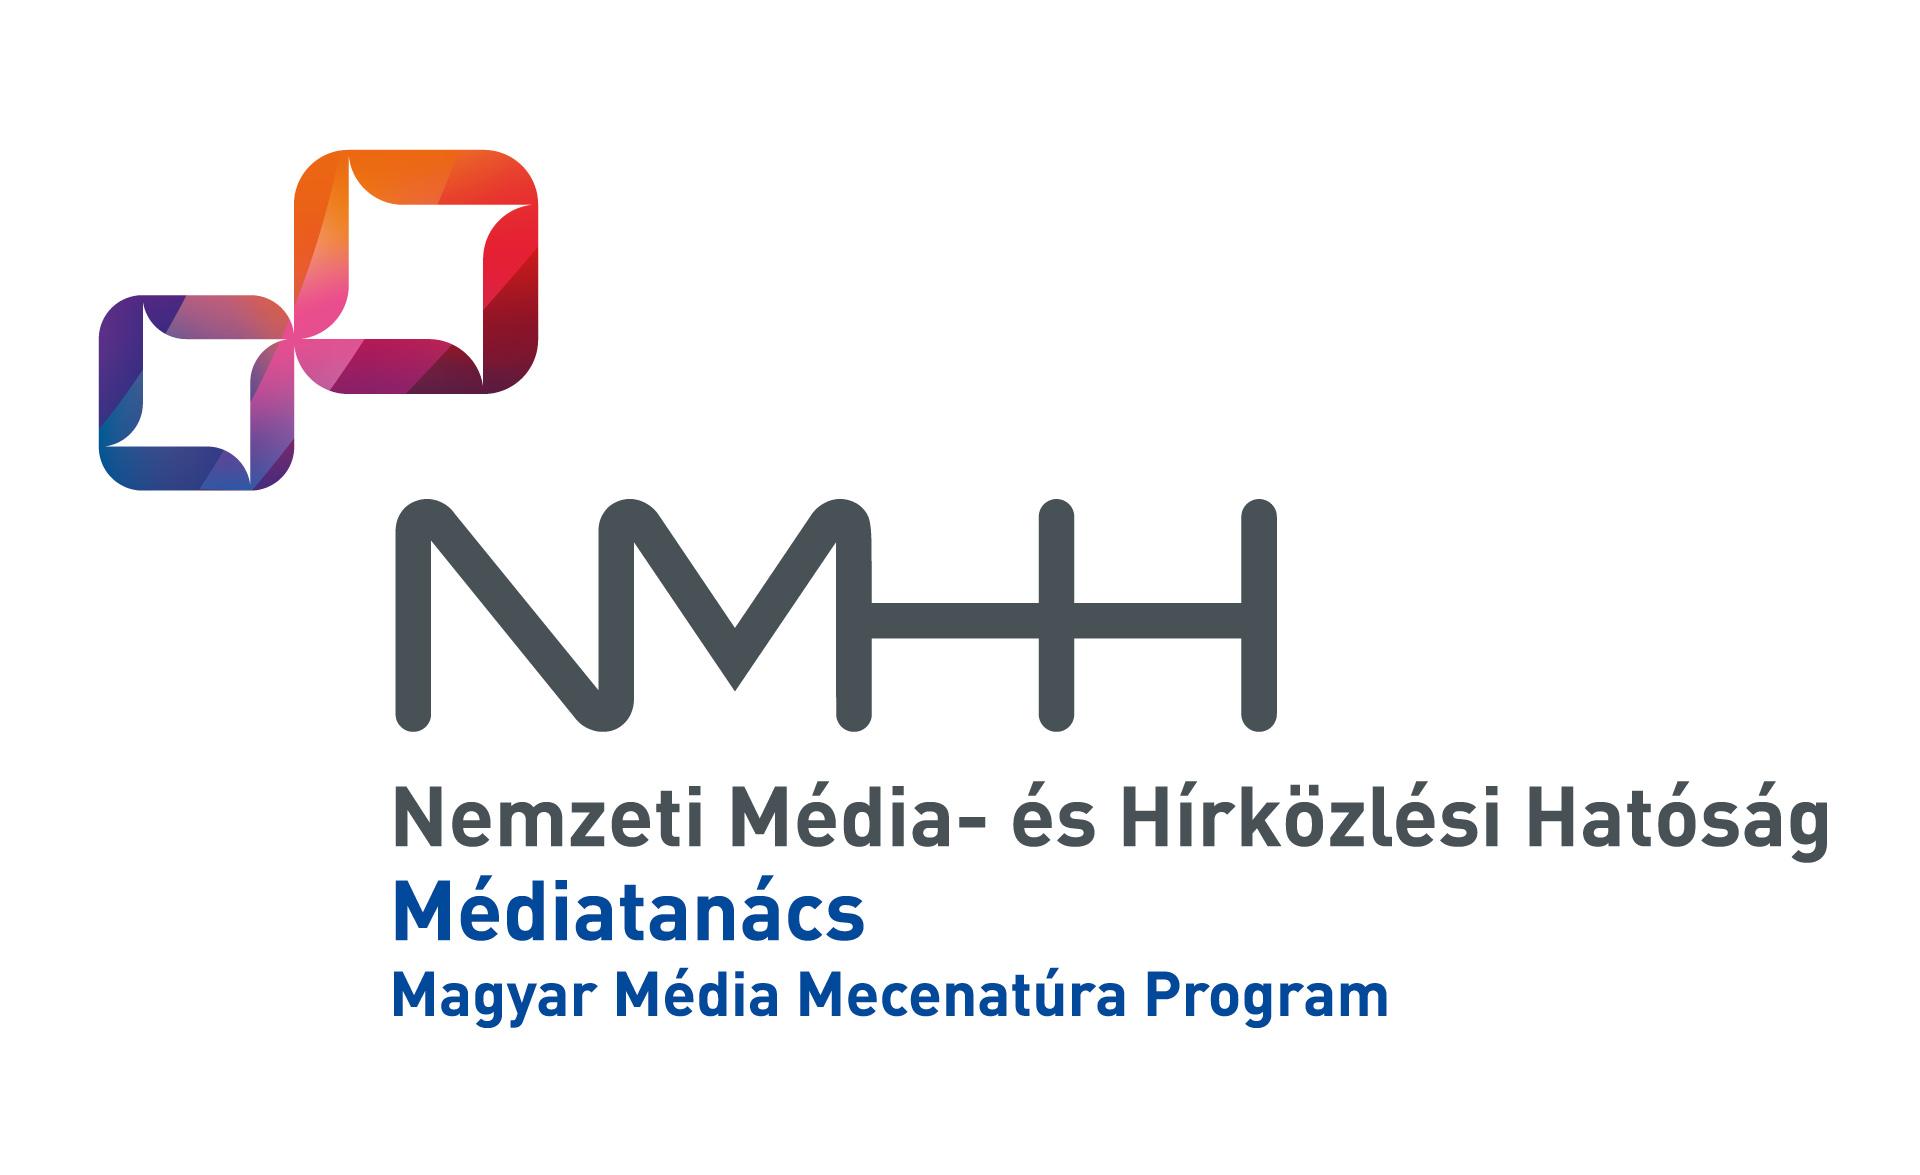 Médiatanács a Magyar Média Mecenatúra Program